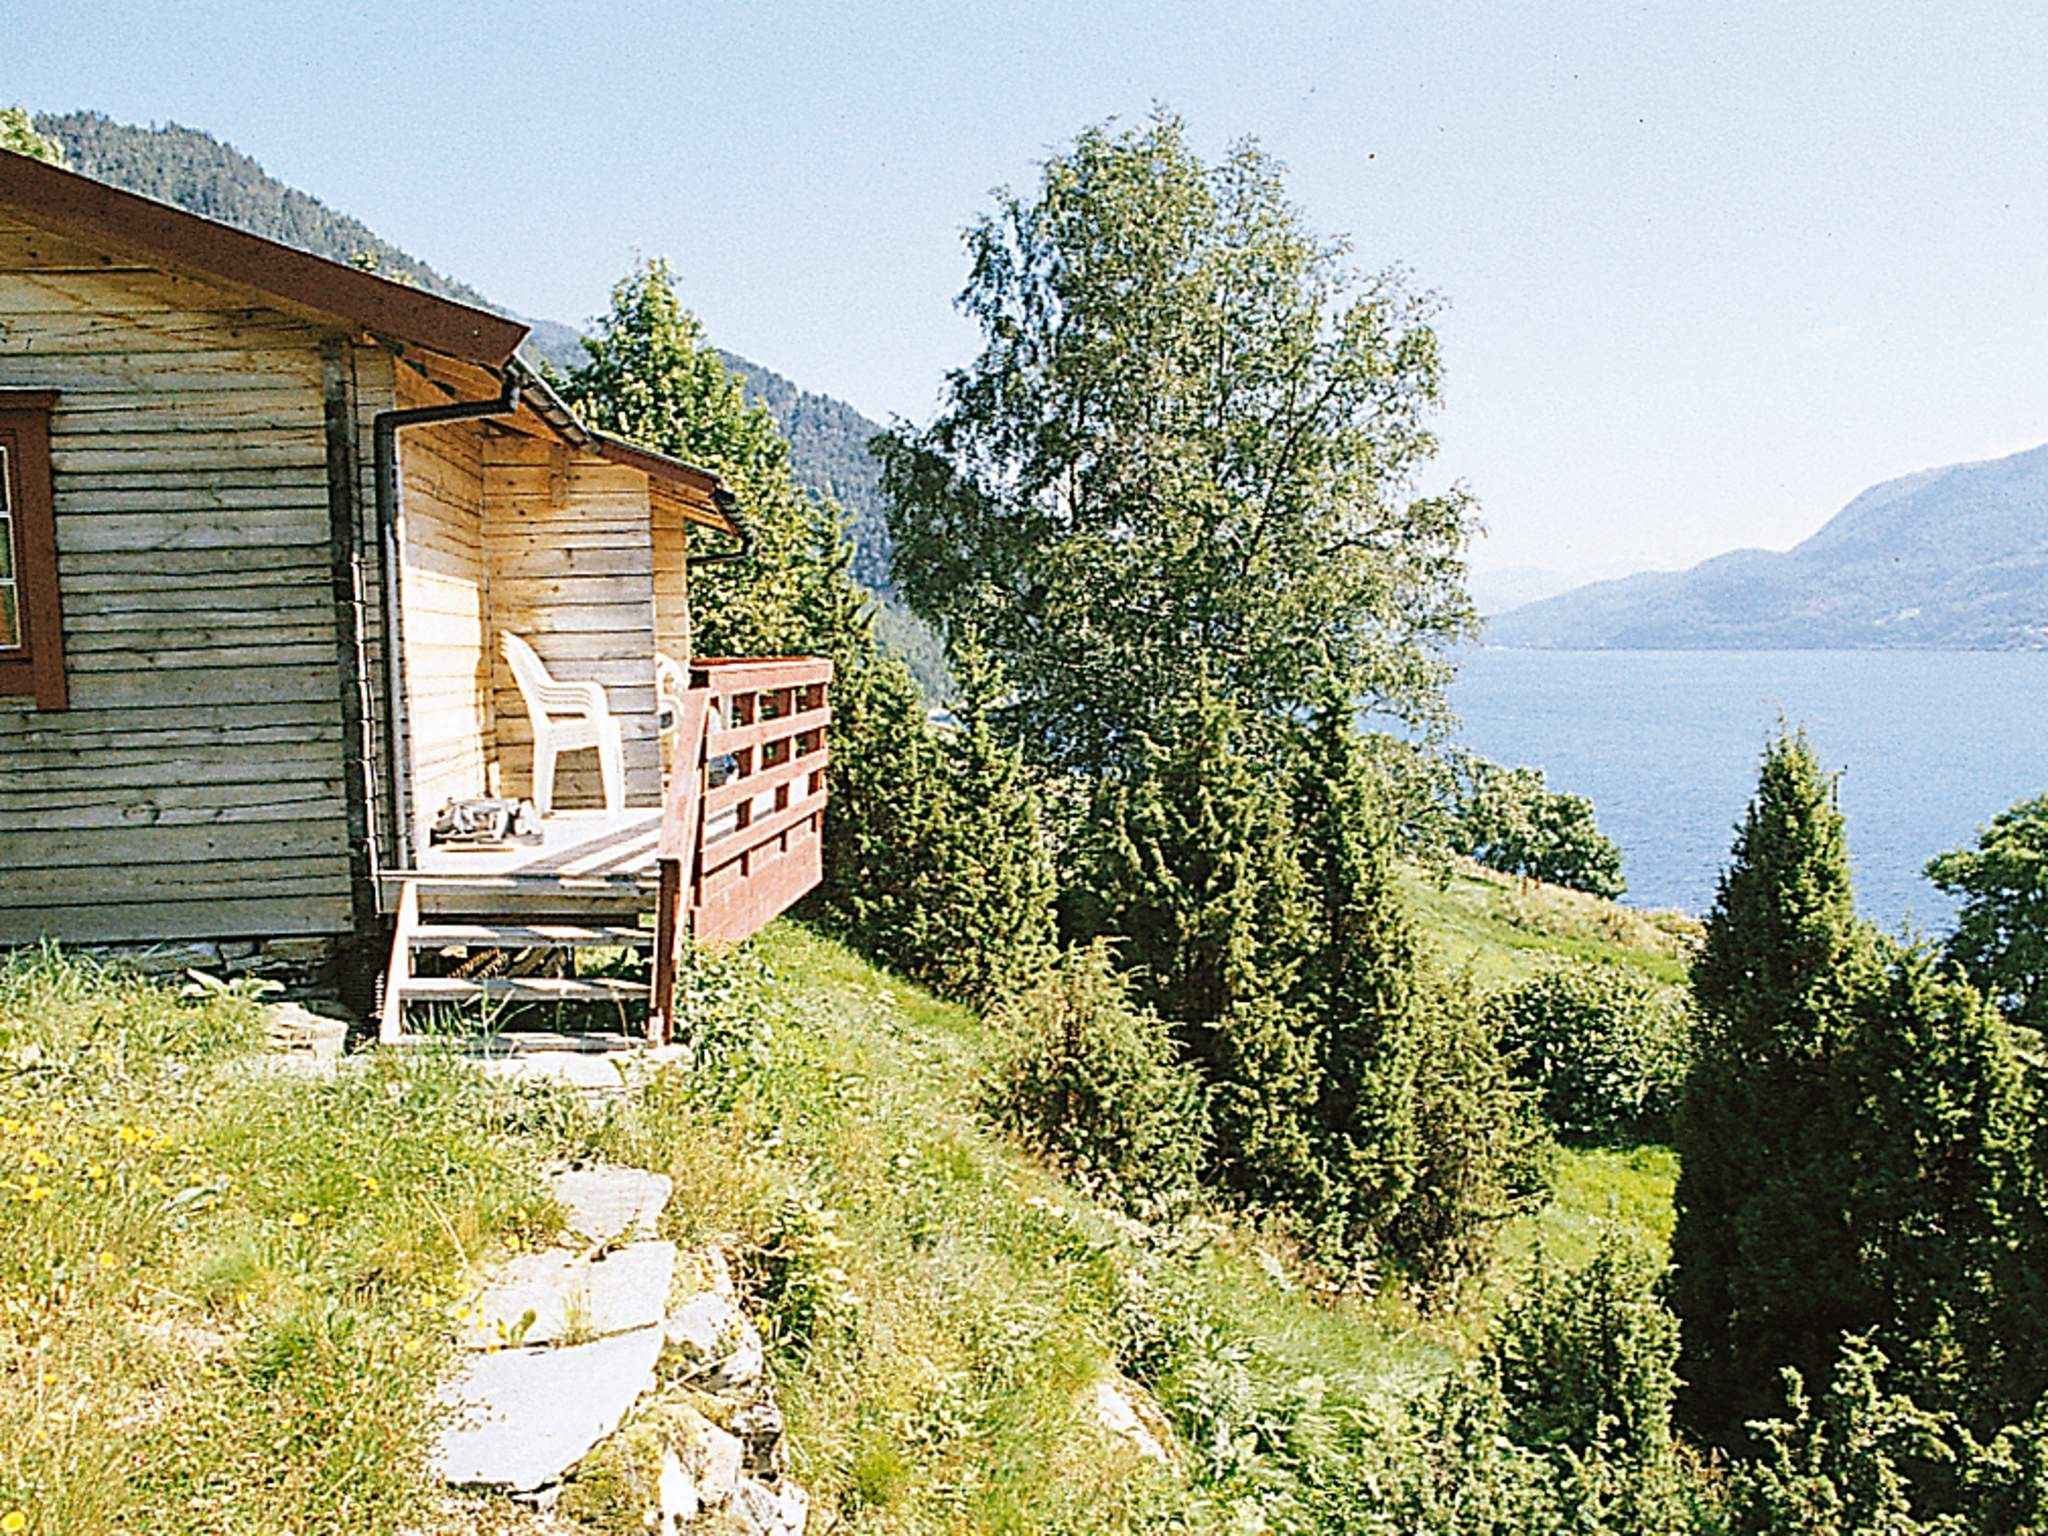 Ferienhaus Heggjabygda (82601), Nordfjordeid, Sognefjord - Nordfjord, Westnorwegen, Norwegen, Bild 5